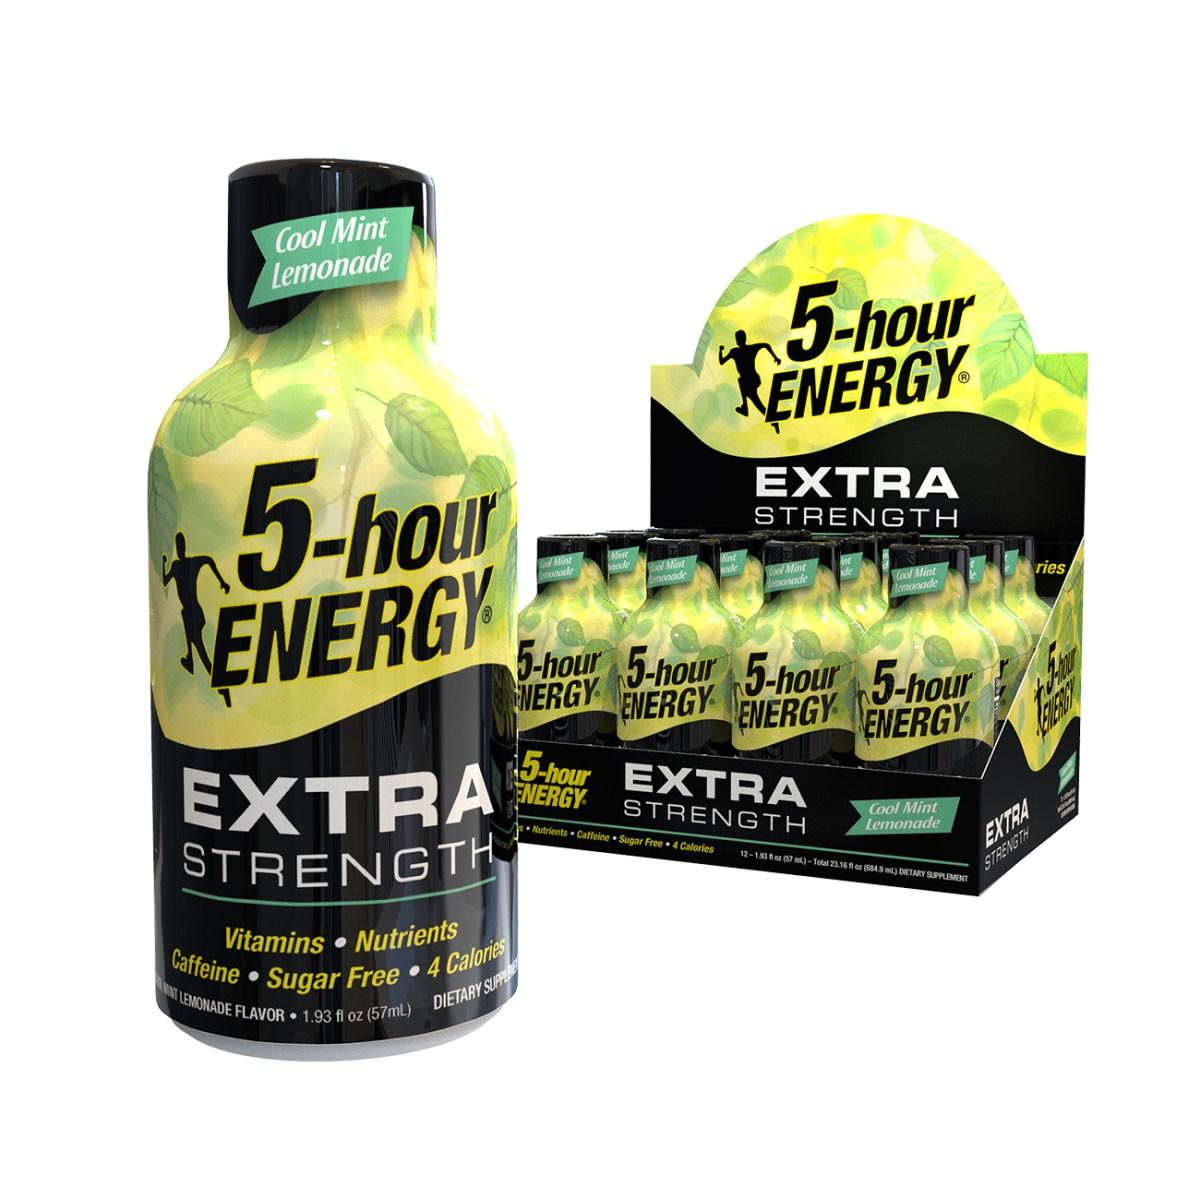 Cool Mint Lemonade flavor Extra Strength 5-hour ENERGY® Shots